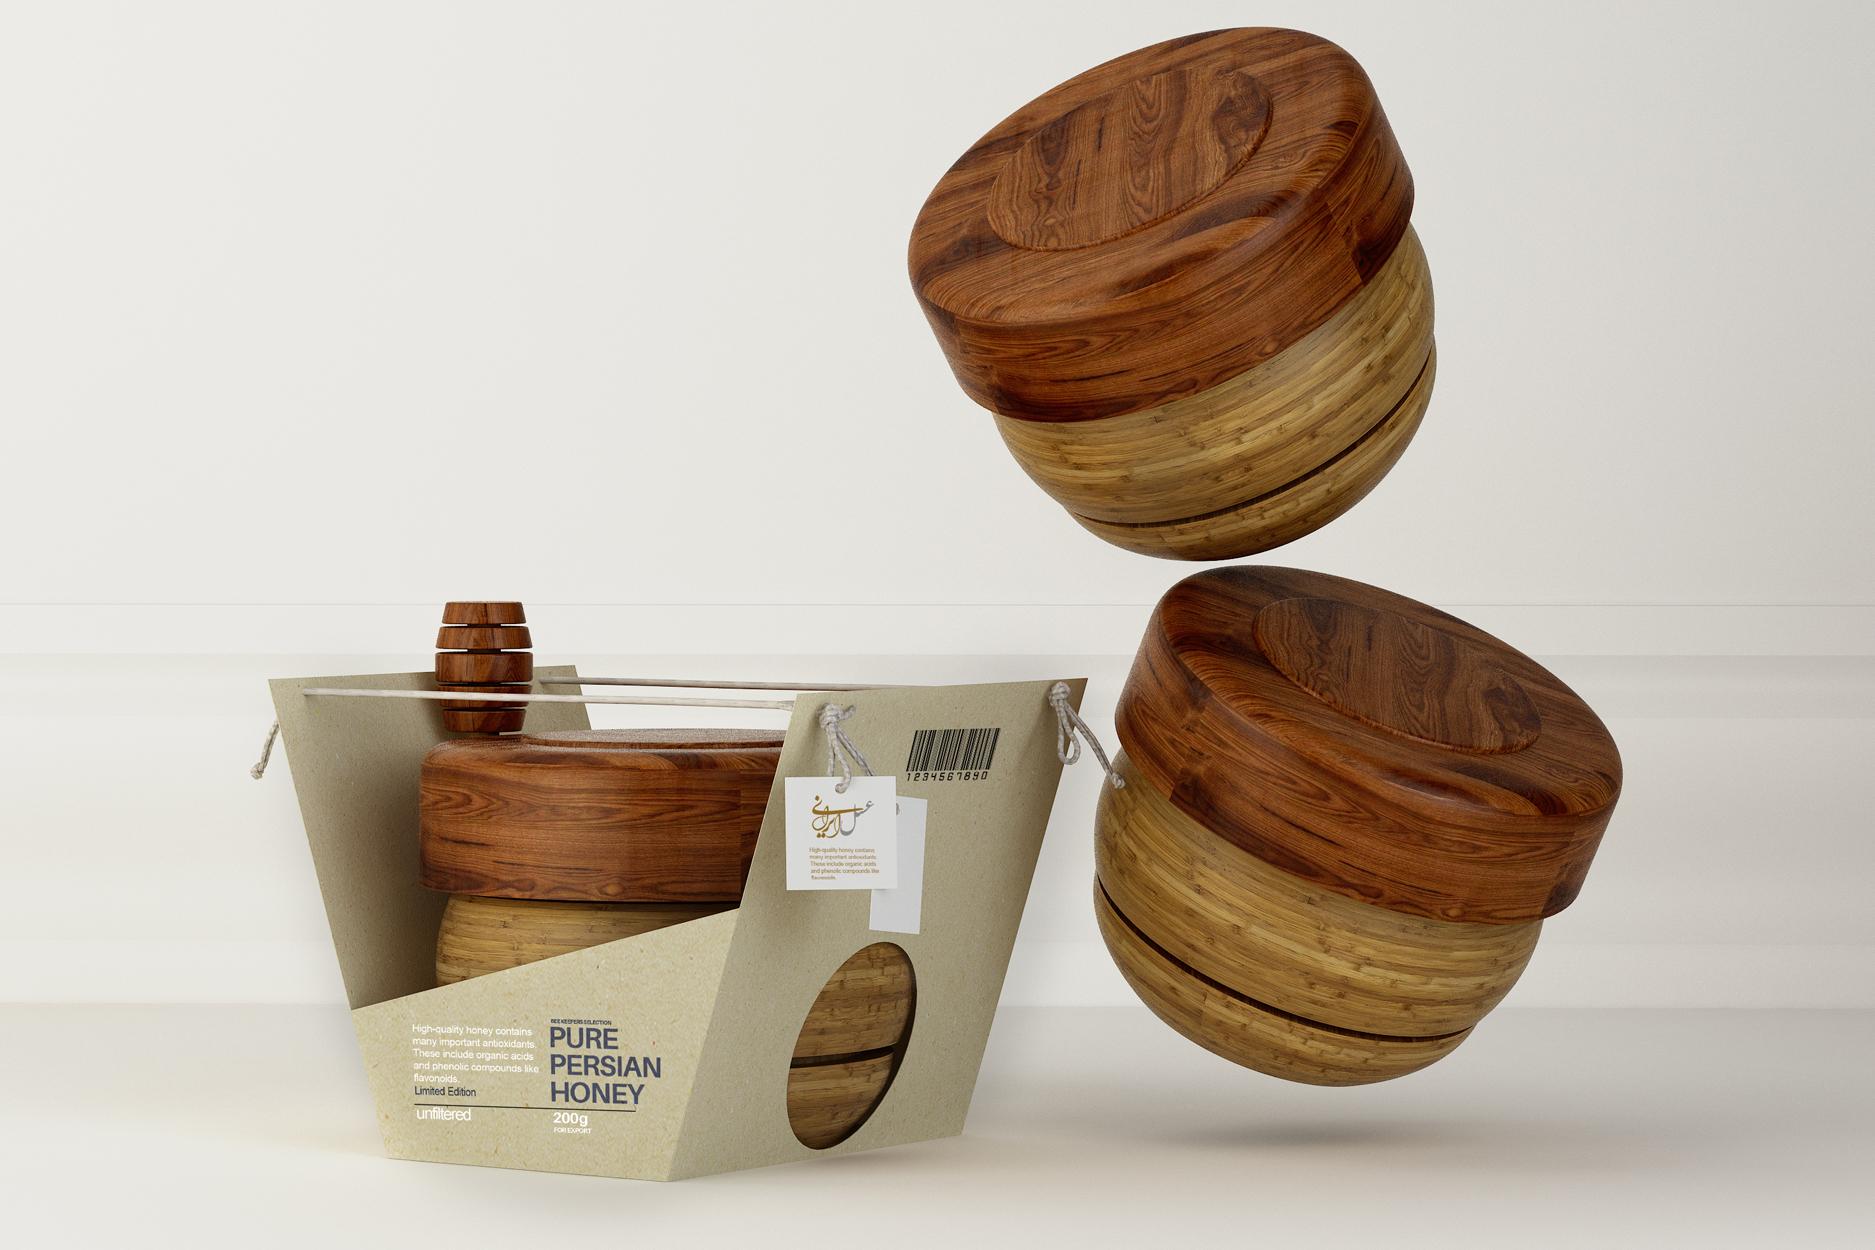 Taha Fakouri Design Creates New Honey Packaging, Persian Pure Honey